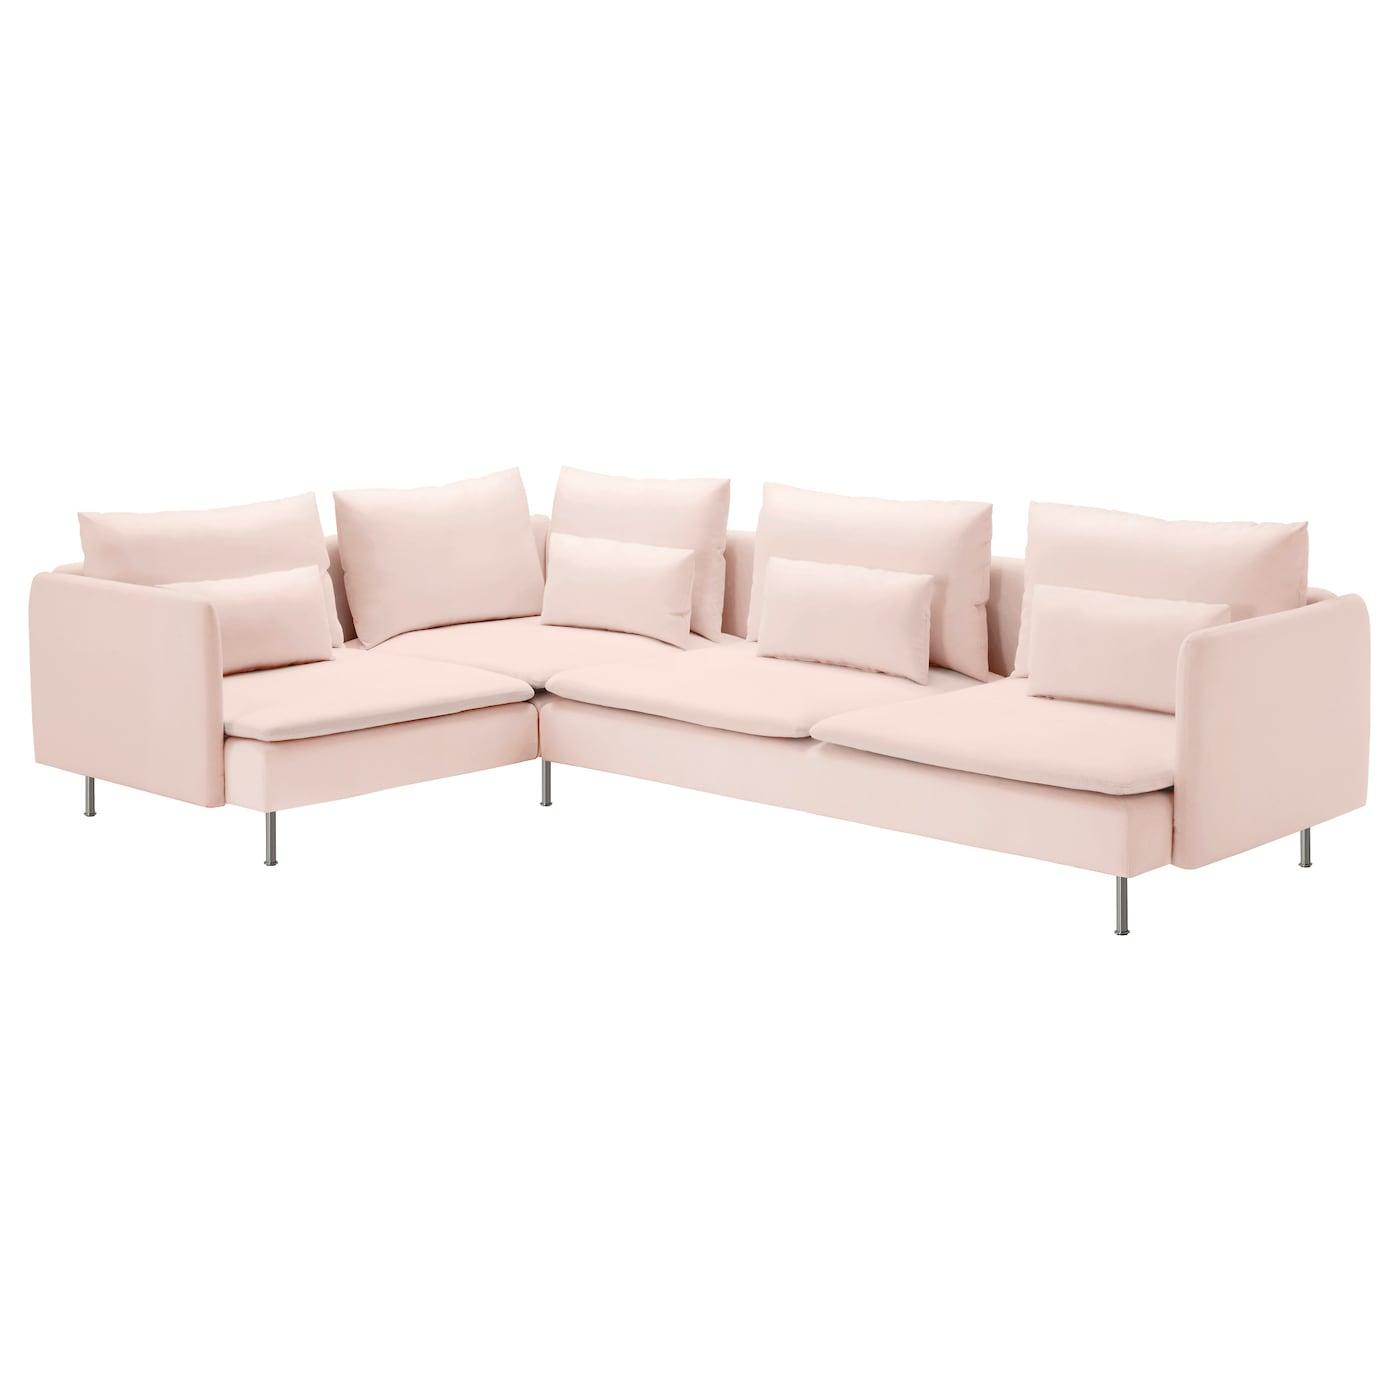 s derhamn sof 4 plazas esquina samsta rosa claro 291 x 198 cm ikea. Black Bedroom Furniture Sets. Home Design Ideas